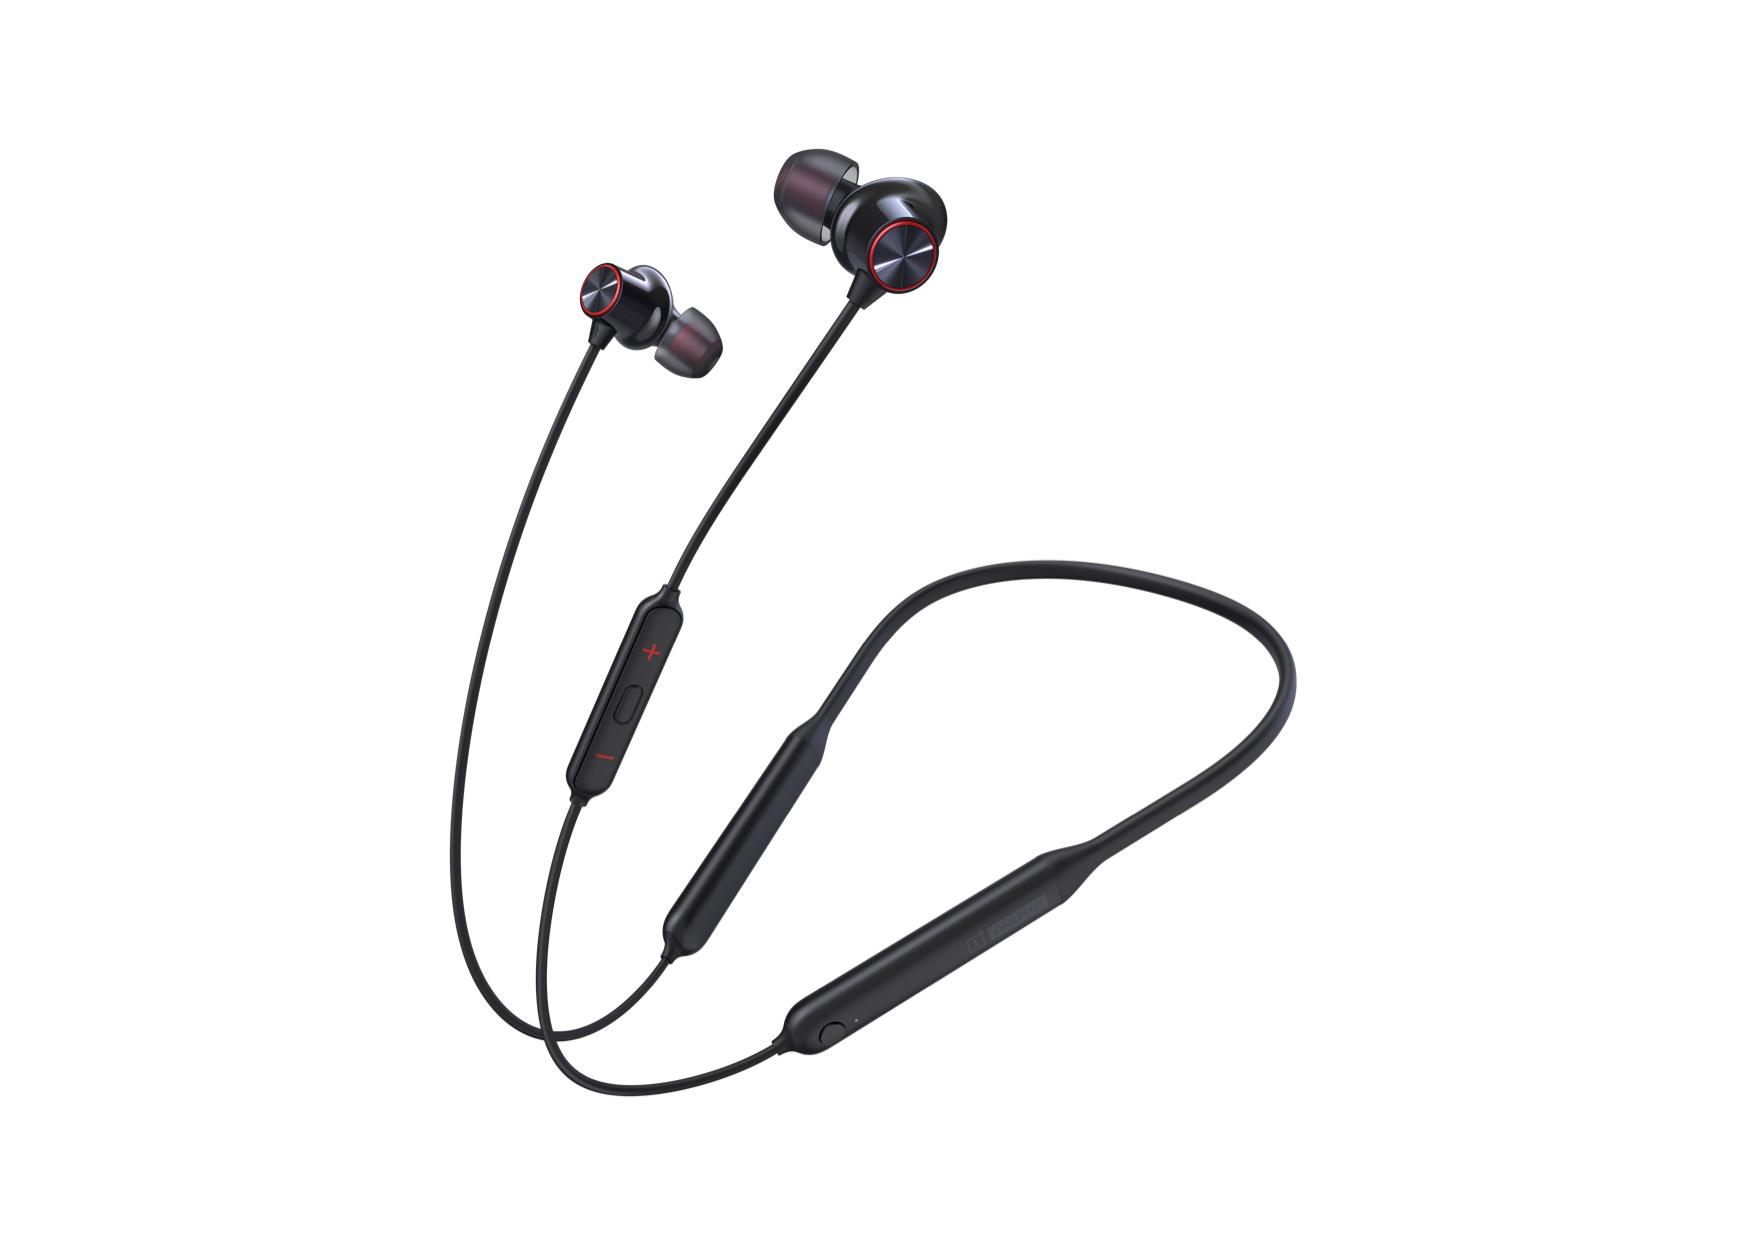 OnePlus launches Bullets Wireless earphones LWTgu5gB8X89QYTXH4rk